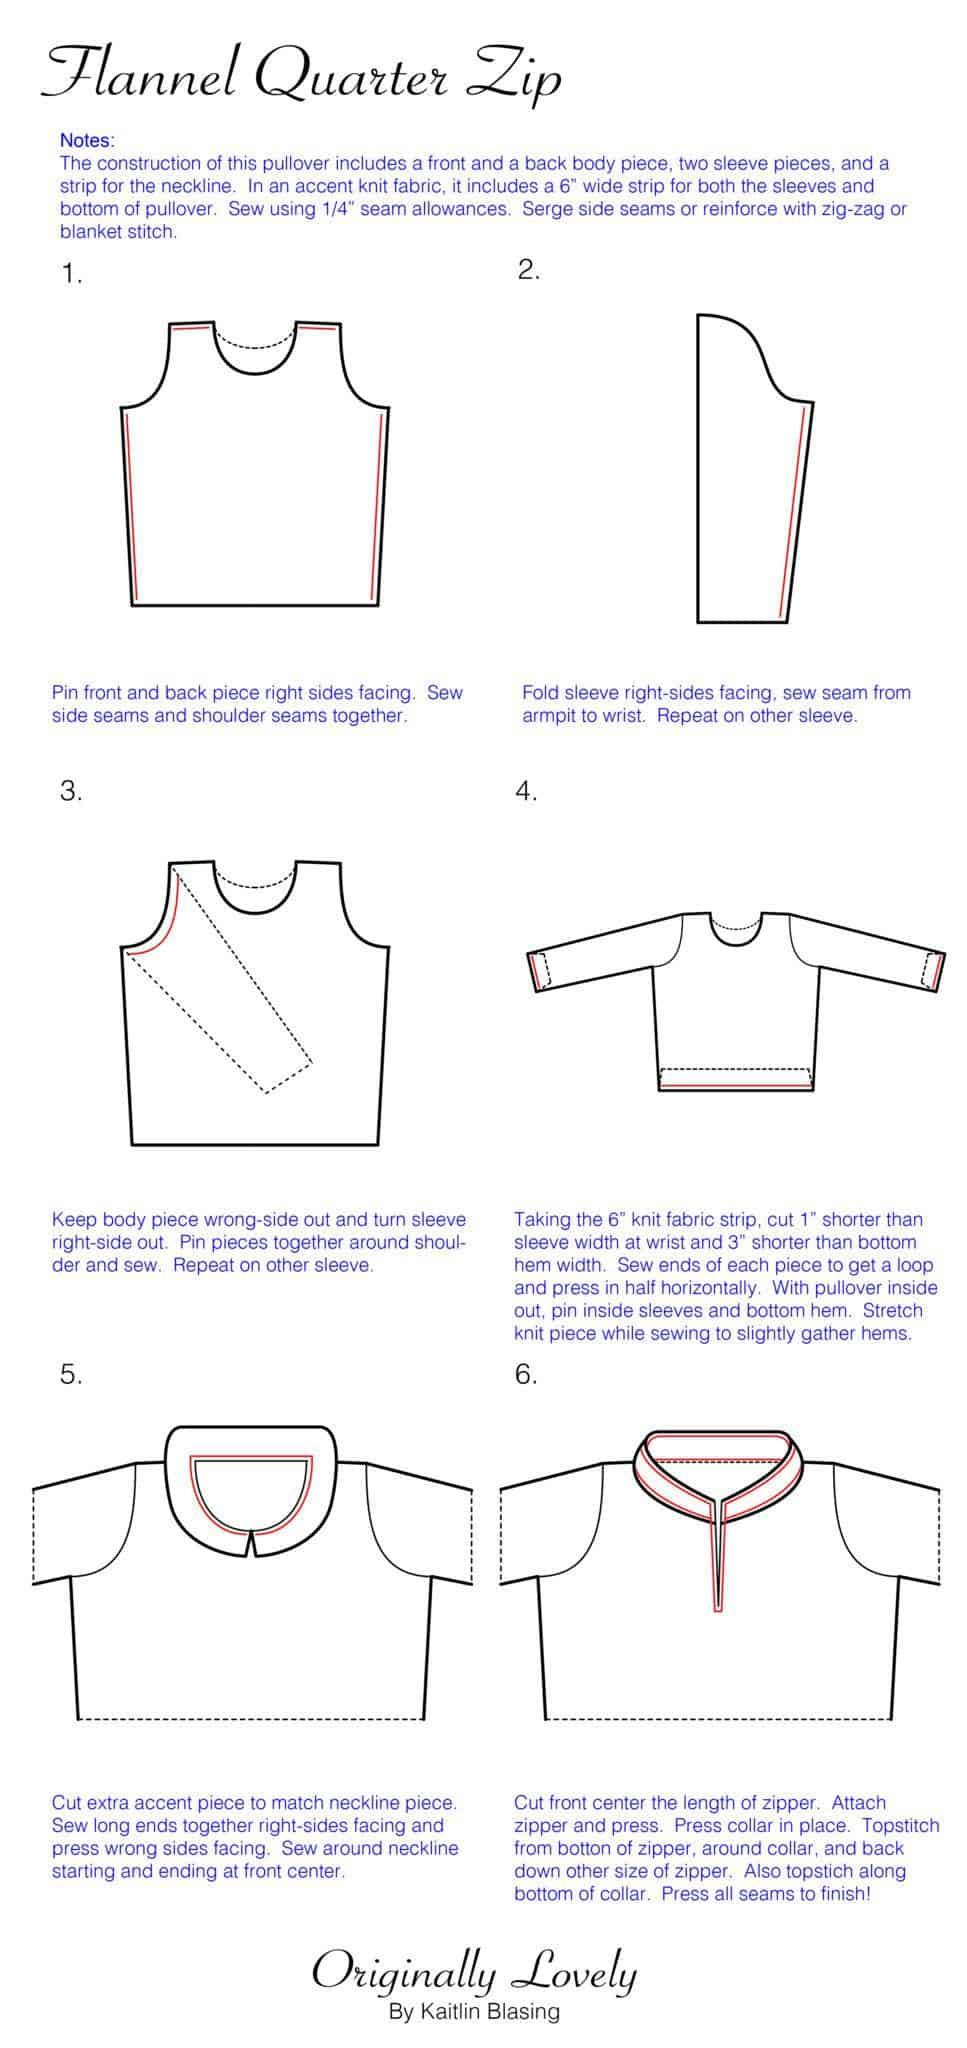 Flannel quarter zip originally lovely flannel quarter zip construction diagram 01 ccuart Images